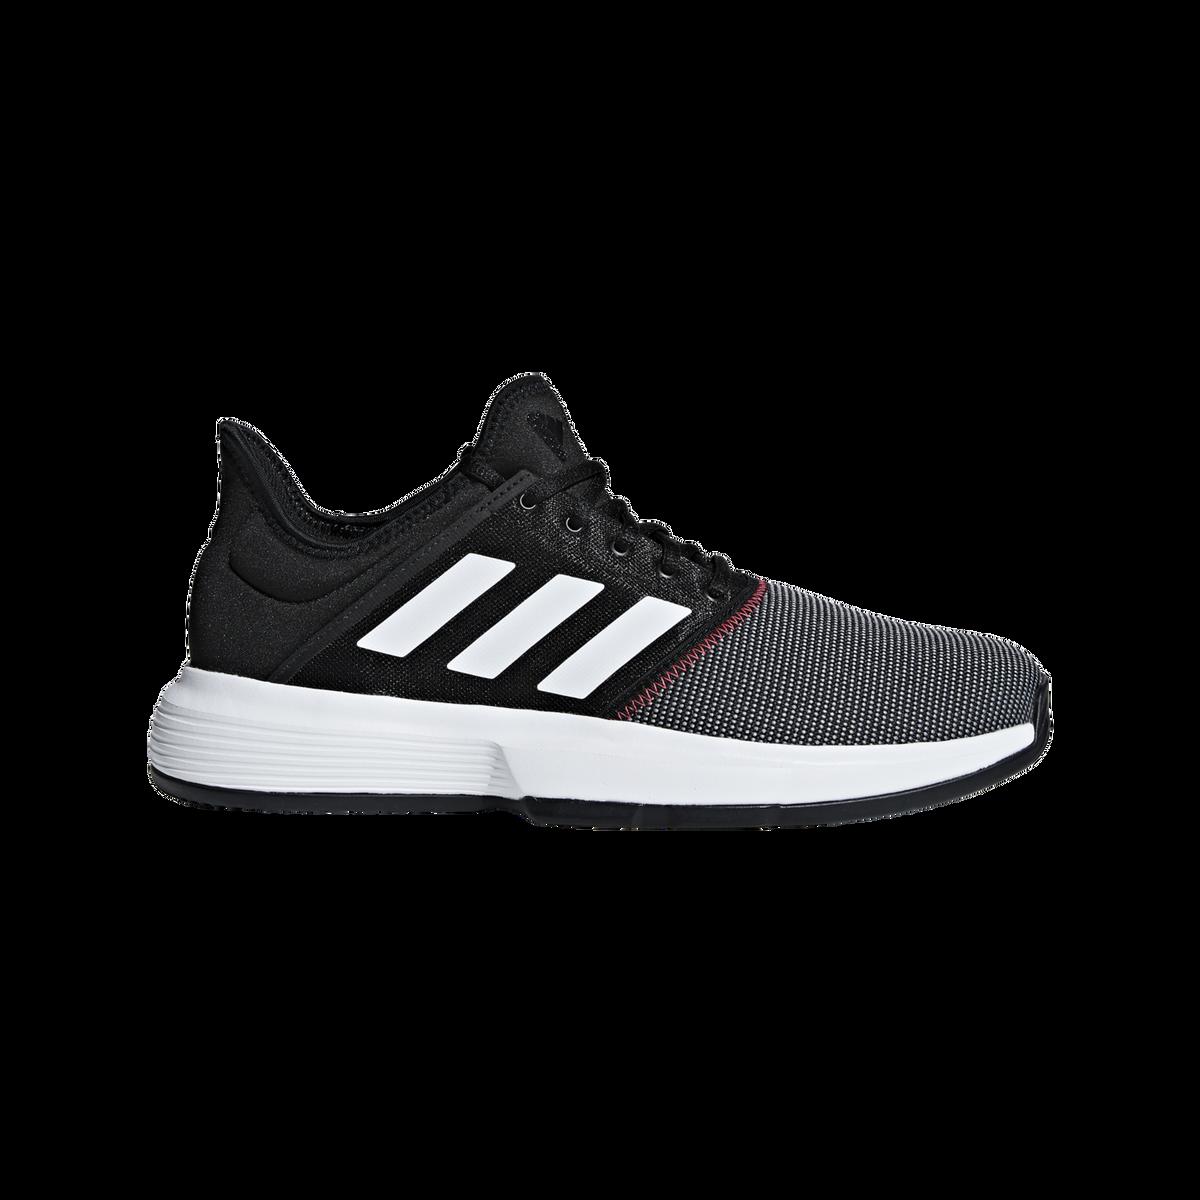 low priced 13d17 d472f Images. adidas GameCourt Men  39 s Tennis Shoe - Black White